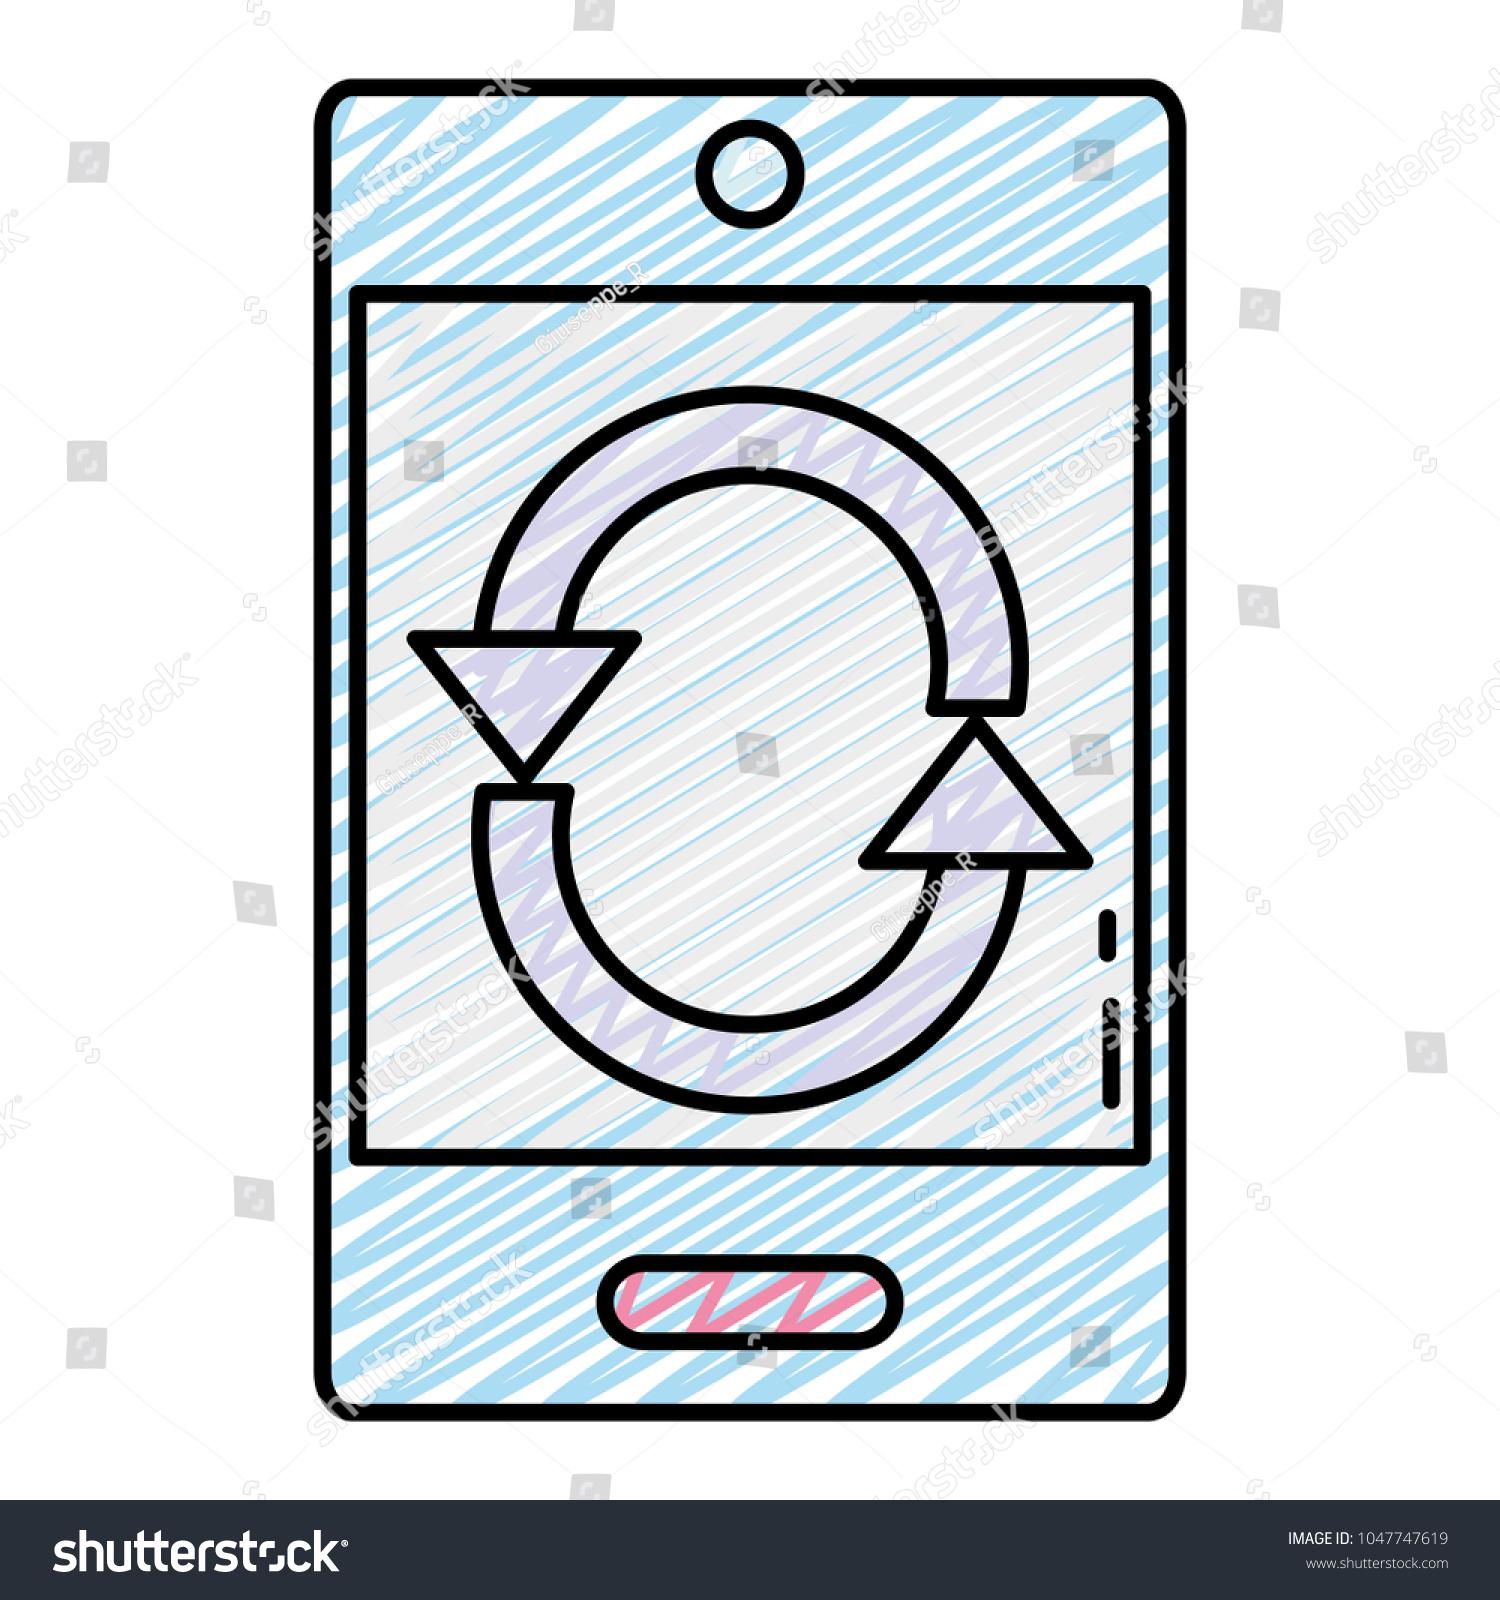 Doodle smartphone technology electronic loading symbol stock doodle smartphone technology with electronic loading symbol biocorpaavc Image collections